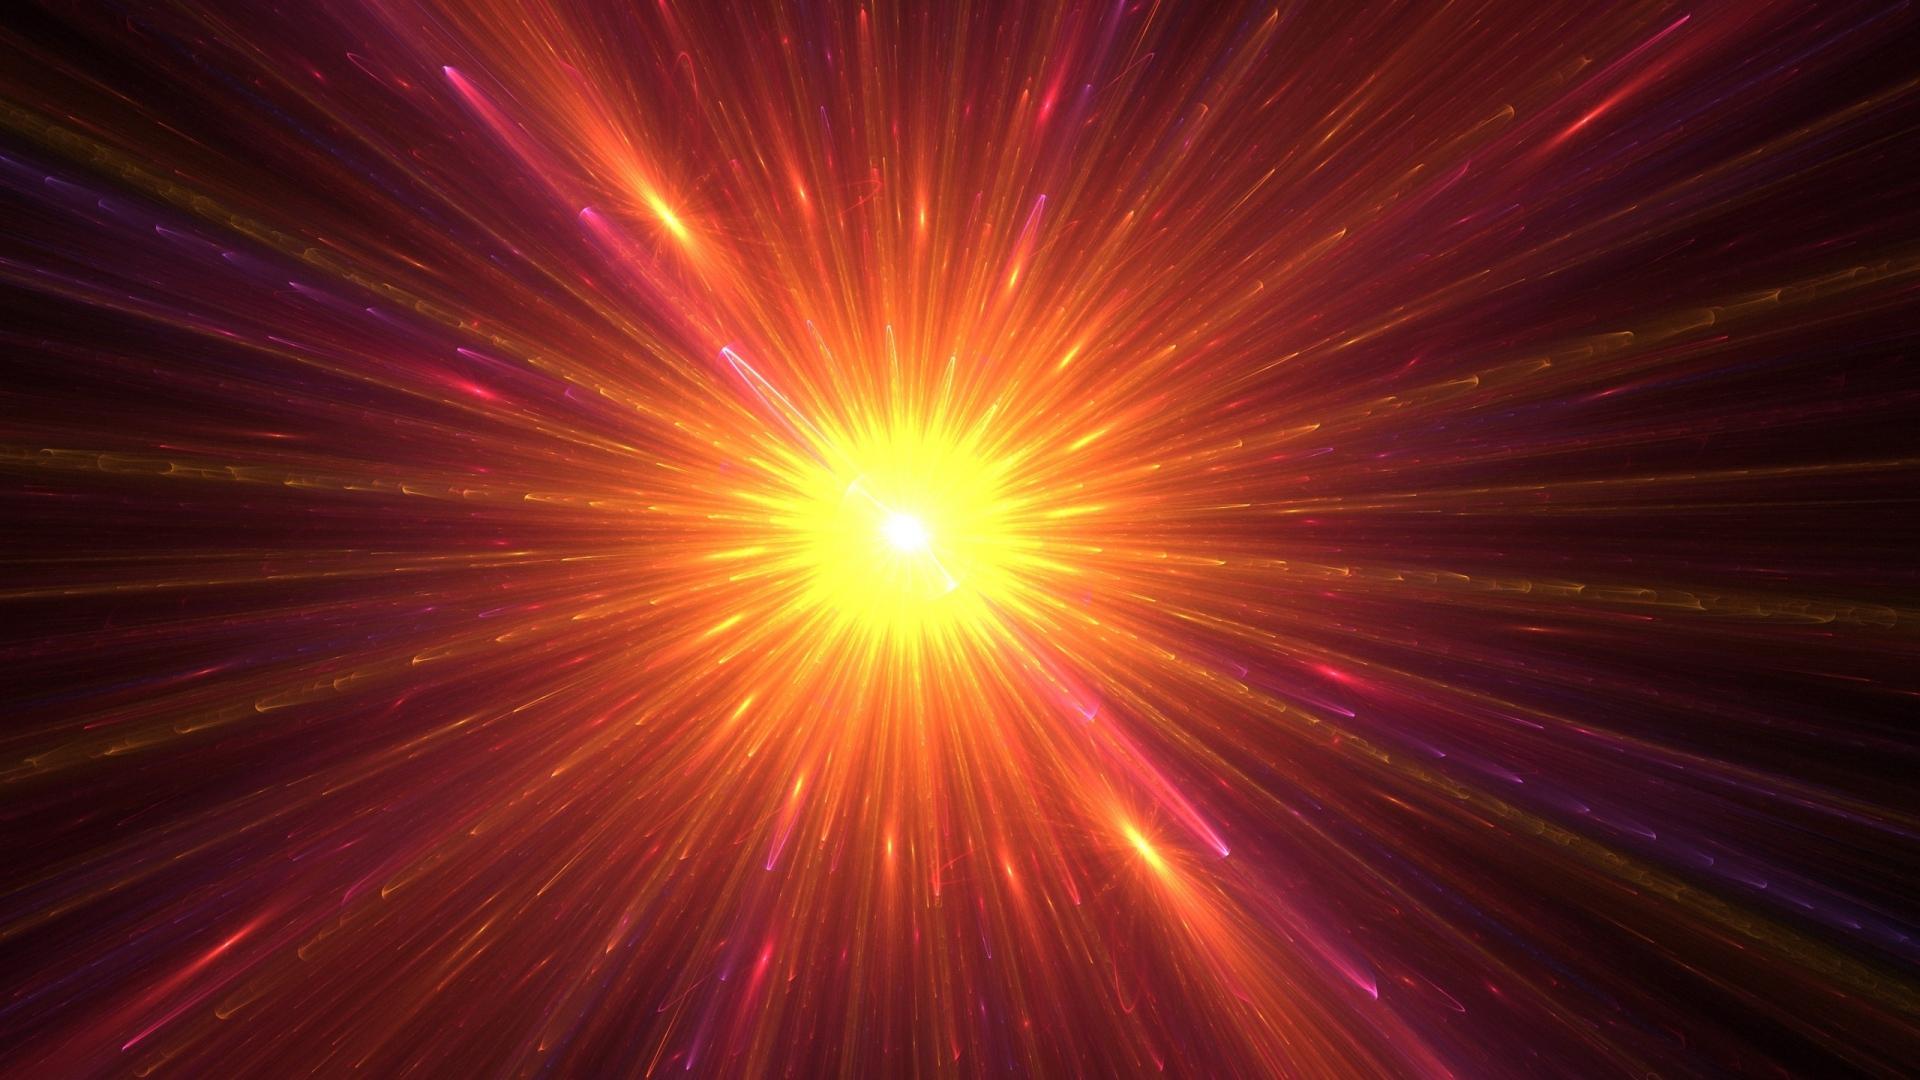 download wallpaper 1920x1080 sun light rays striking